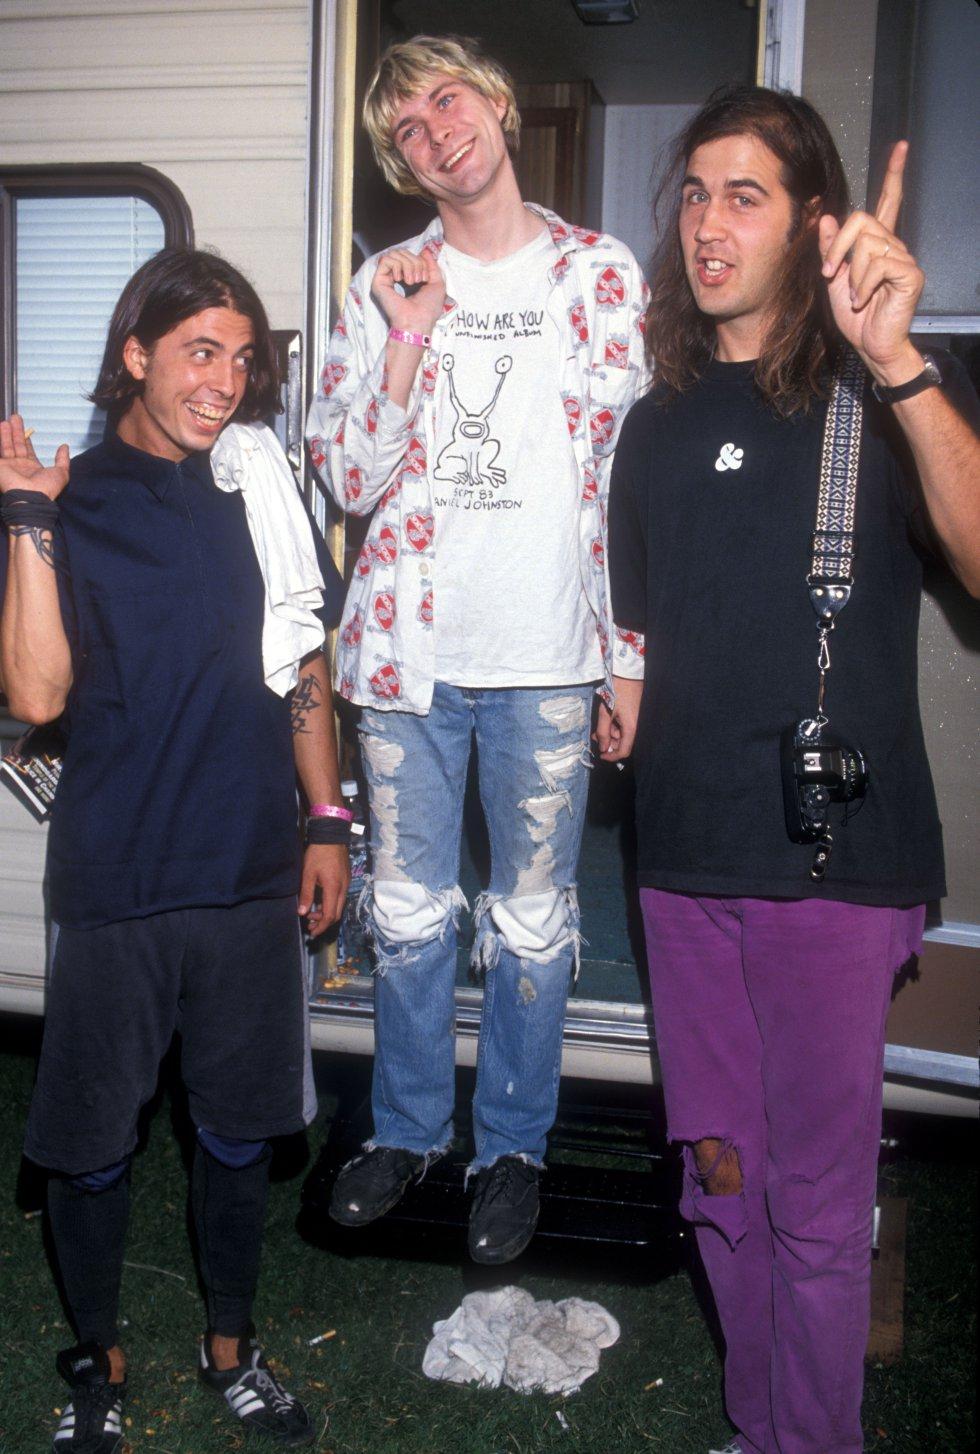 Kurt Donald Cobain nació en Aberdeen, Washington, 20 de febrero de 1967.